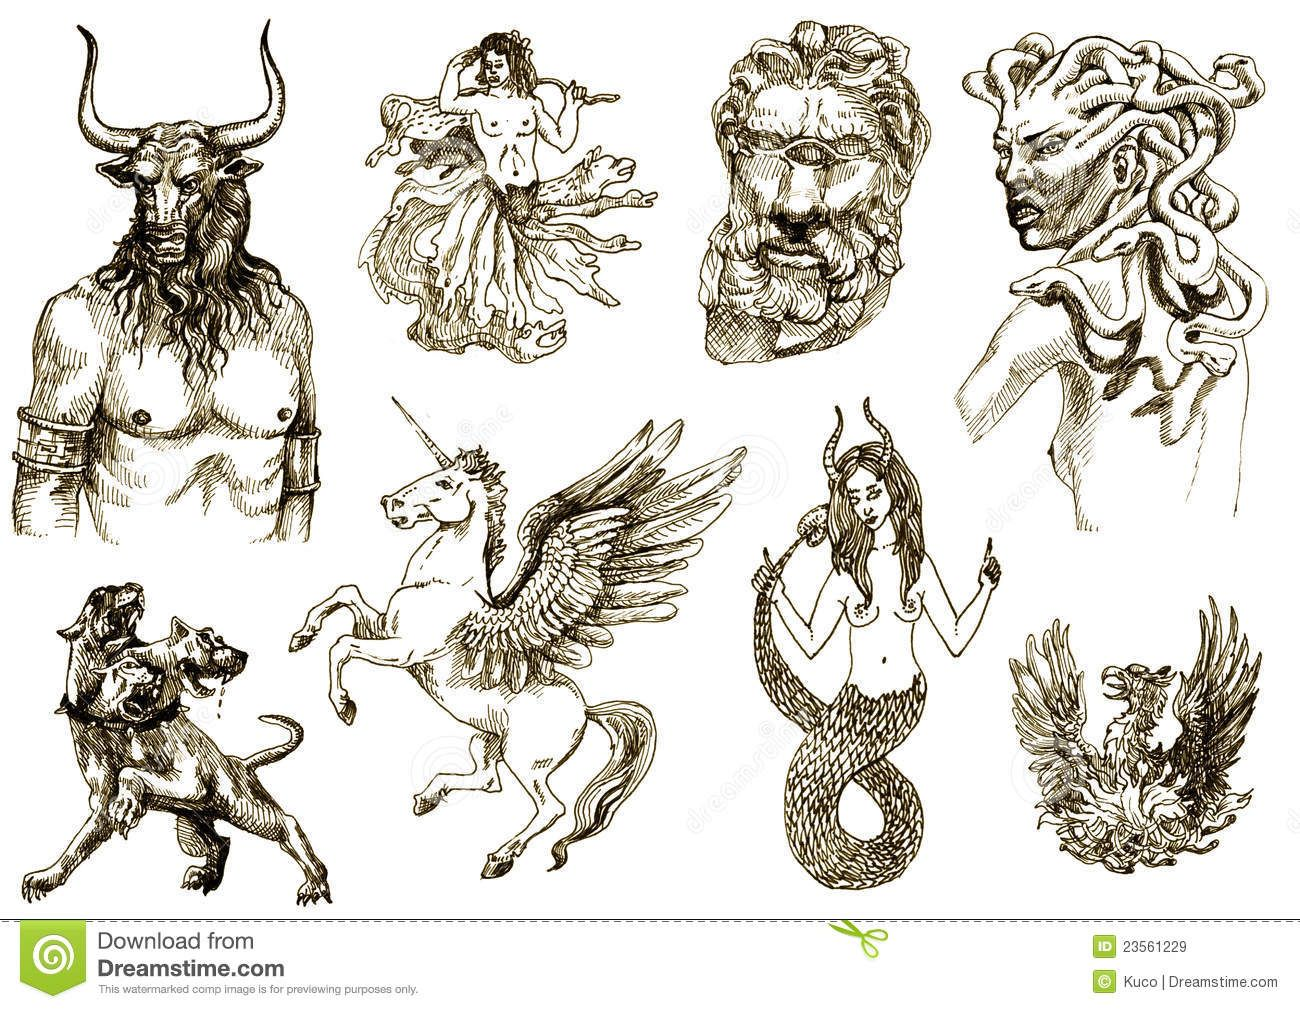 All Greek Mythology Creatures